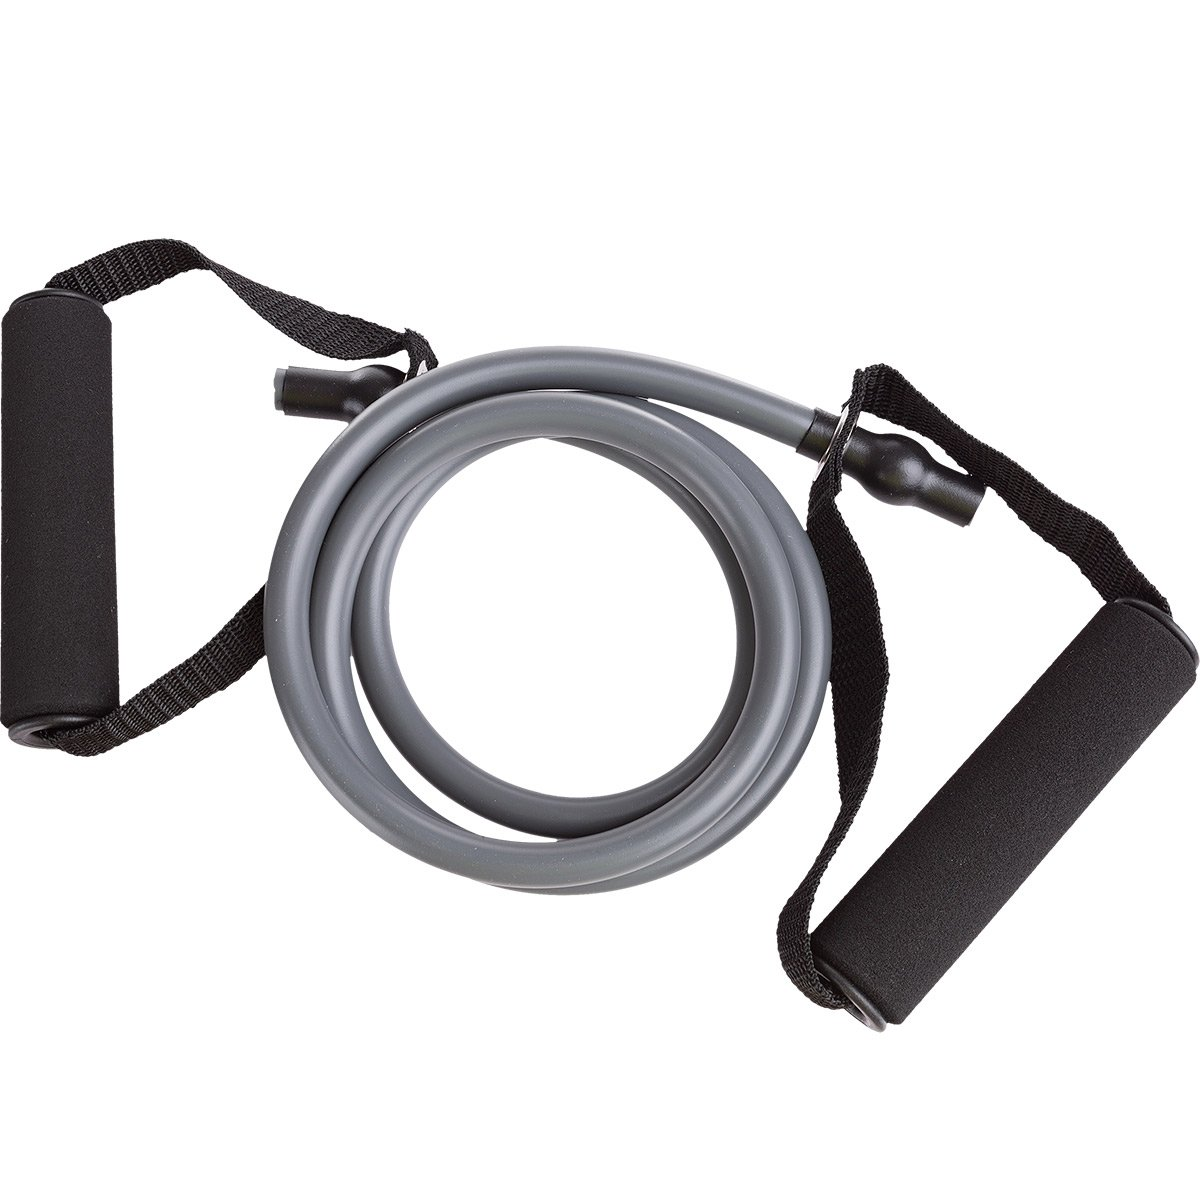 Køb Endurance Toning Tube – Medium